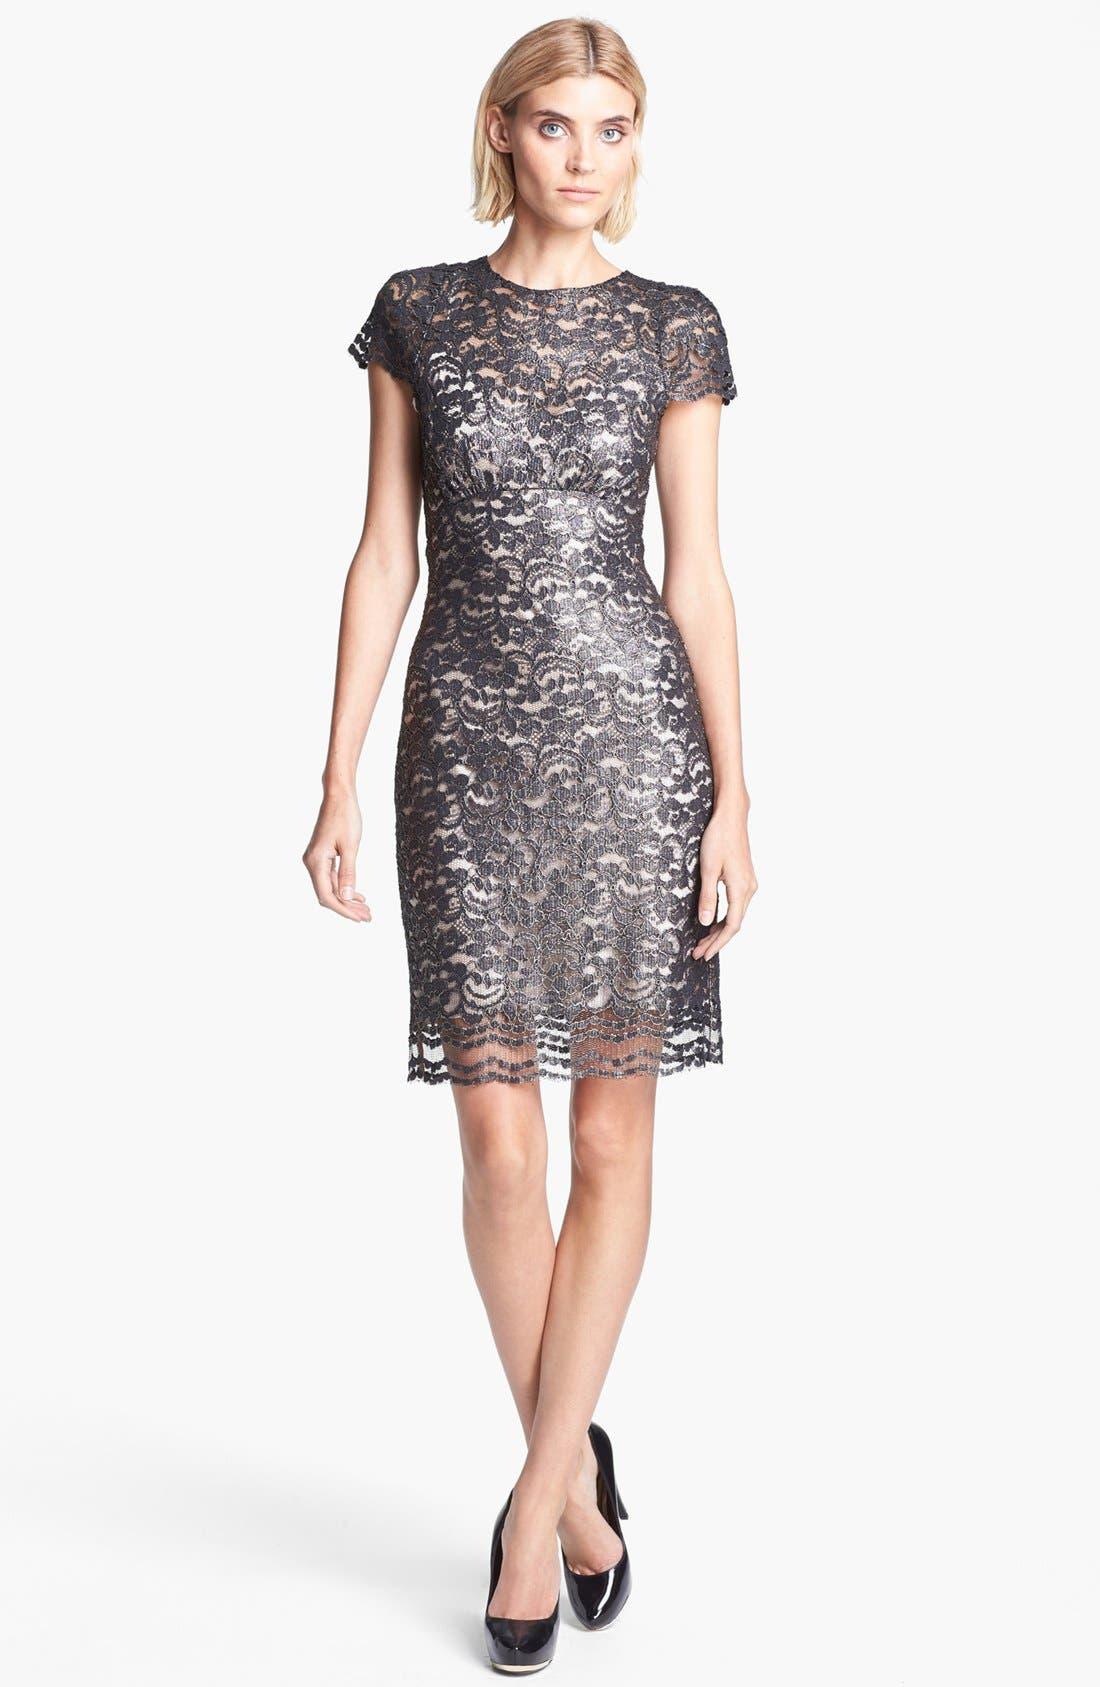 Alternate Image 1 Selected - L'AGENCE Short Sleeve Lace Dress